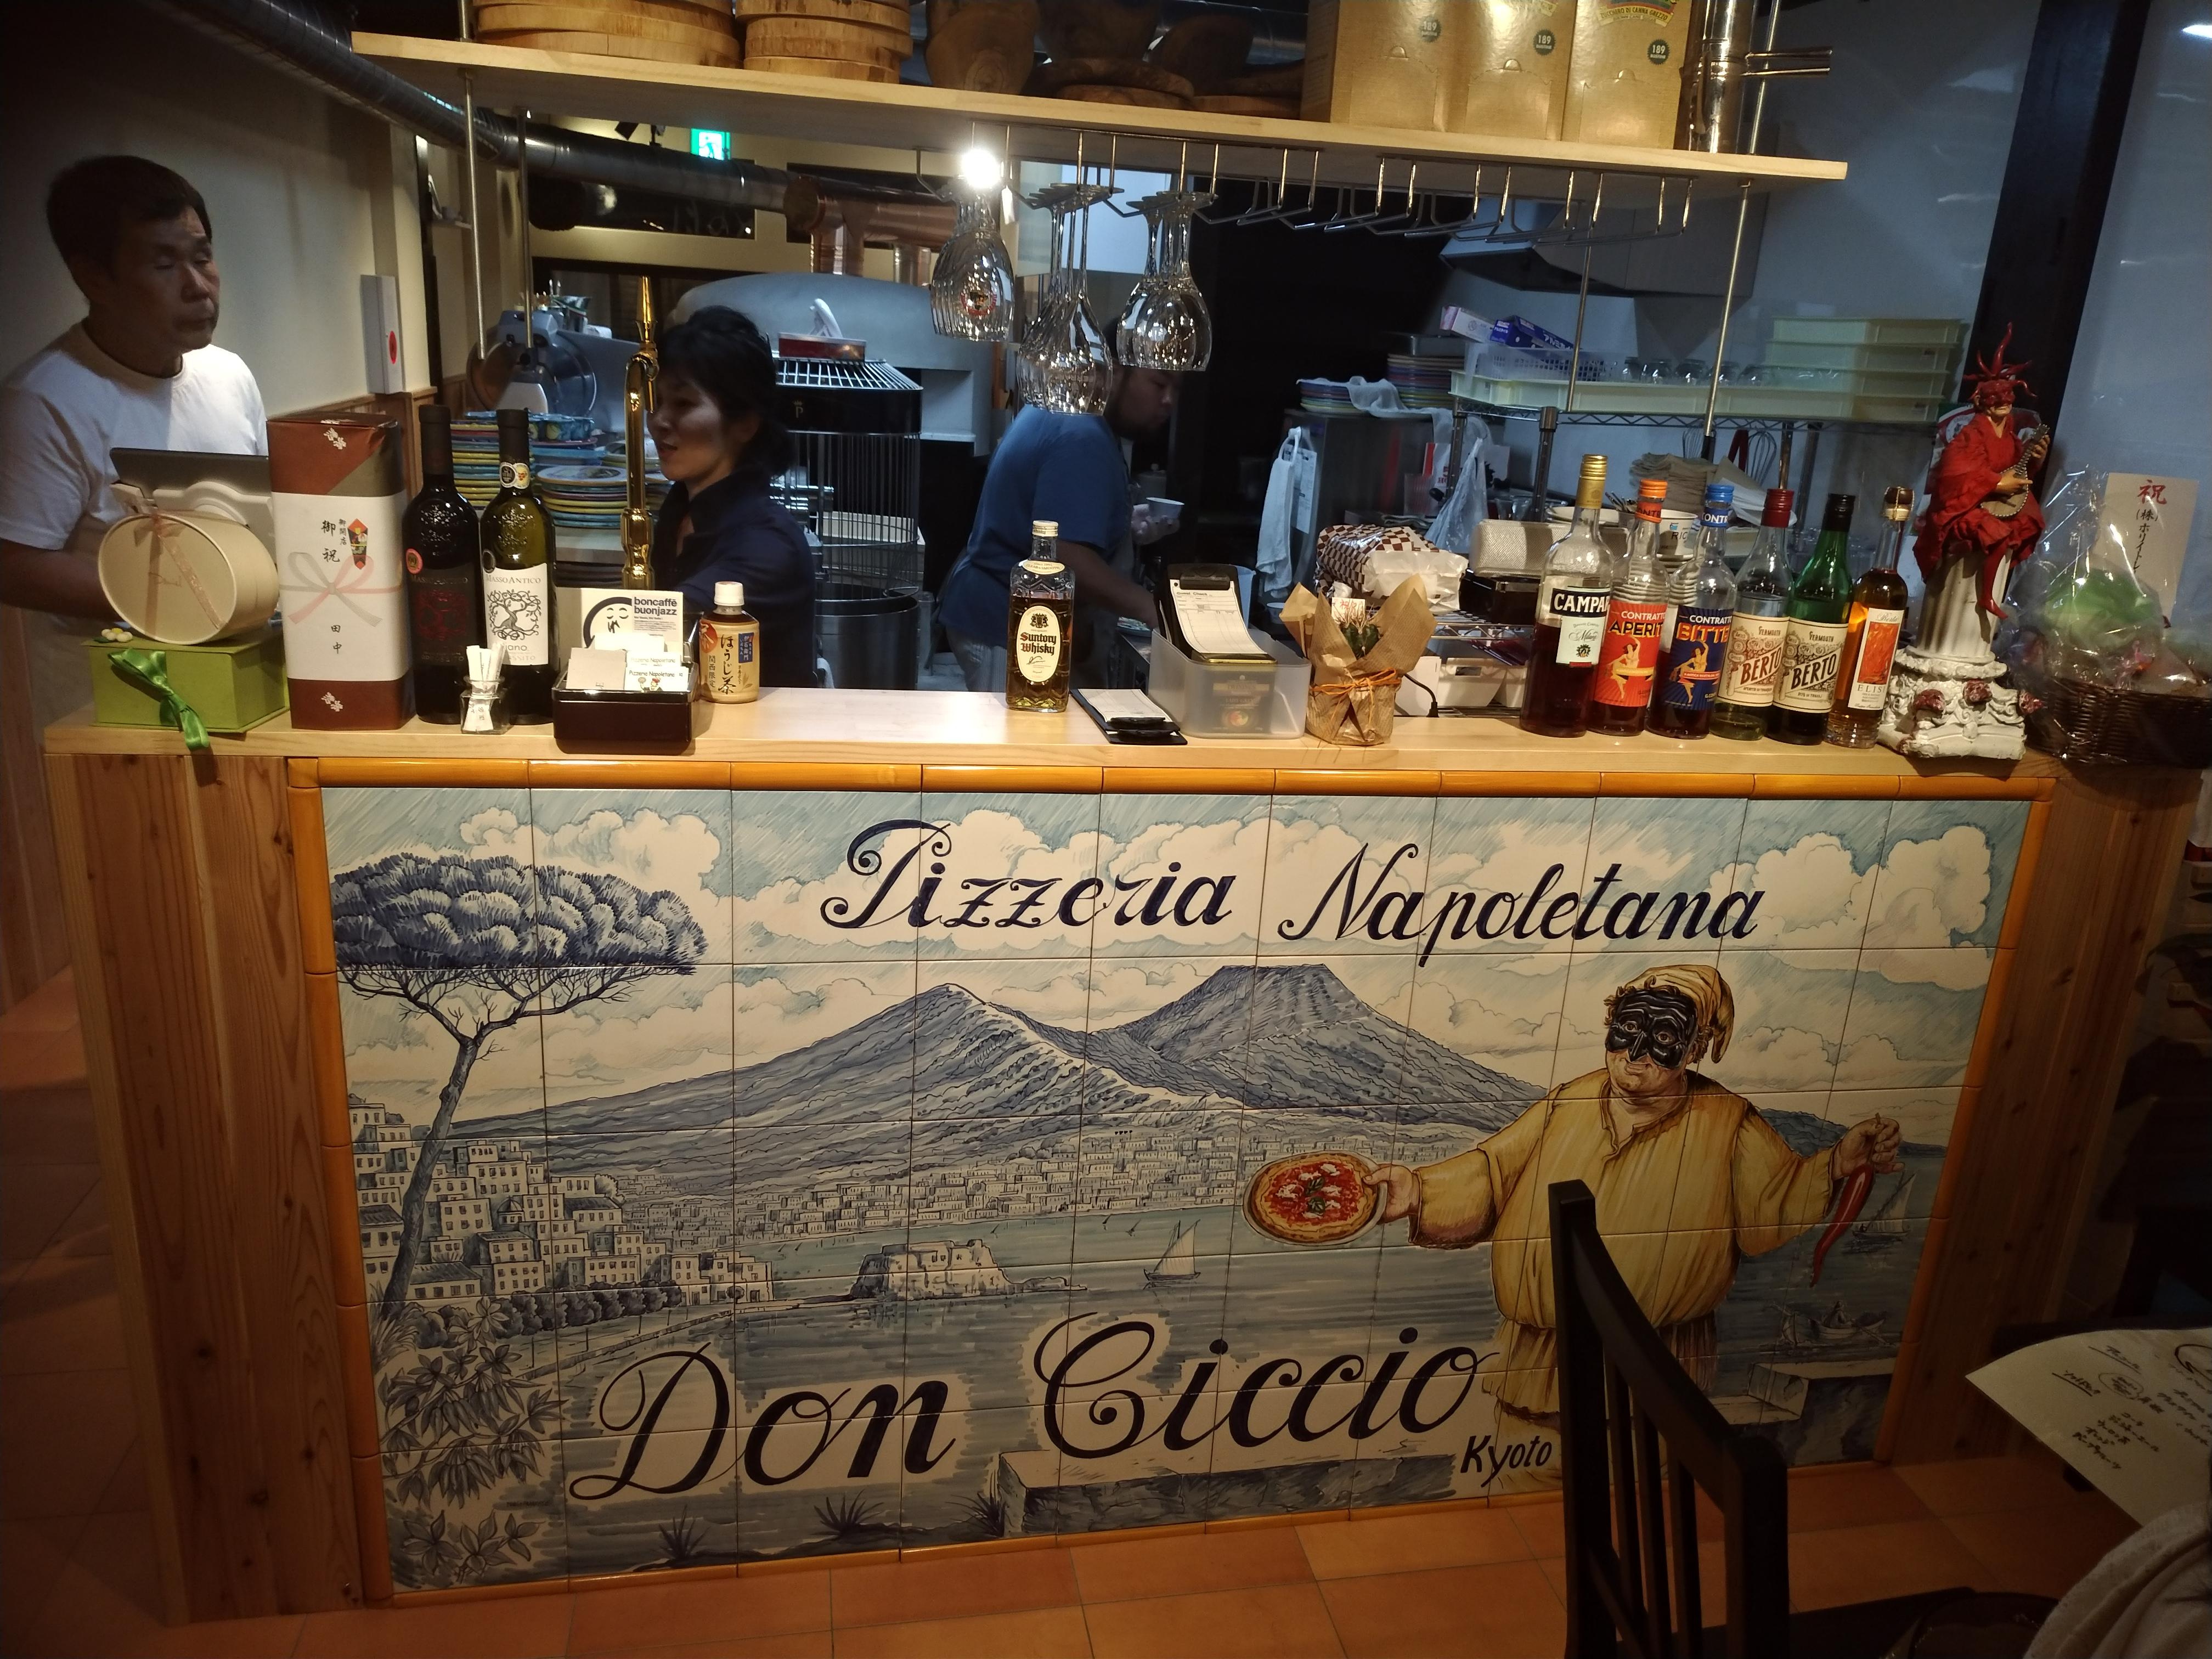 Pizzeria Napoletana Don Ciccio